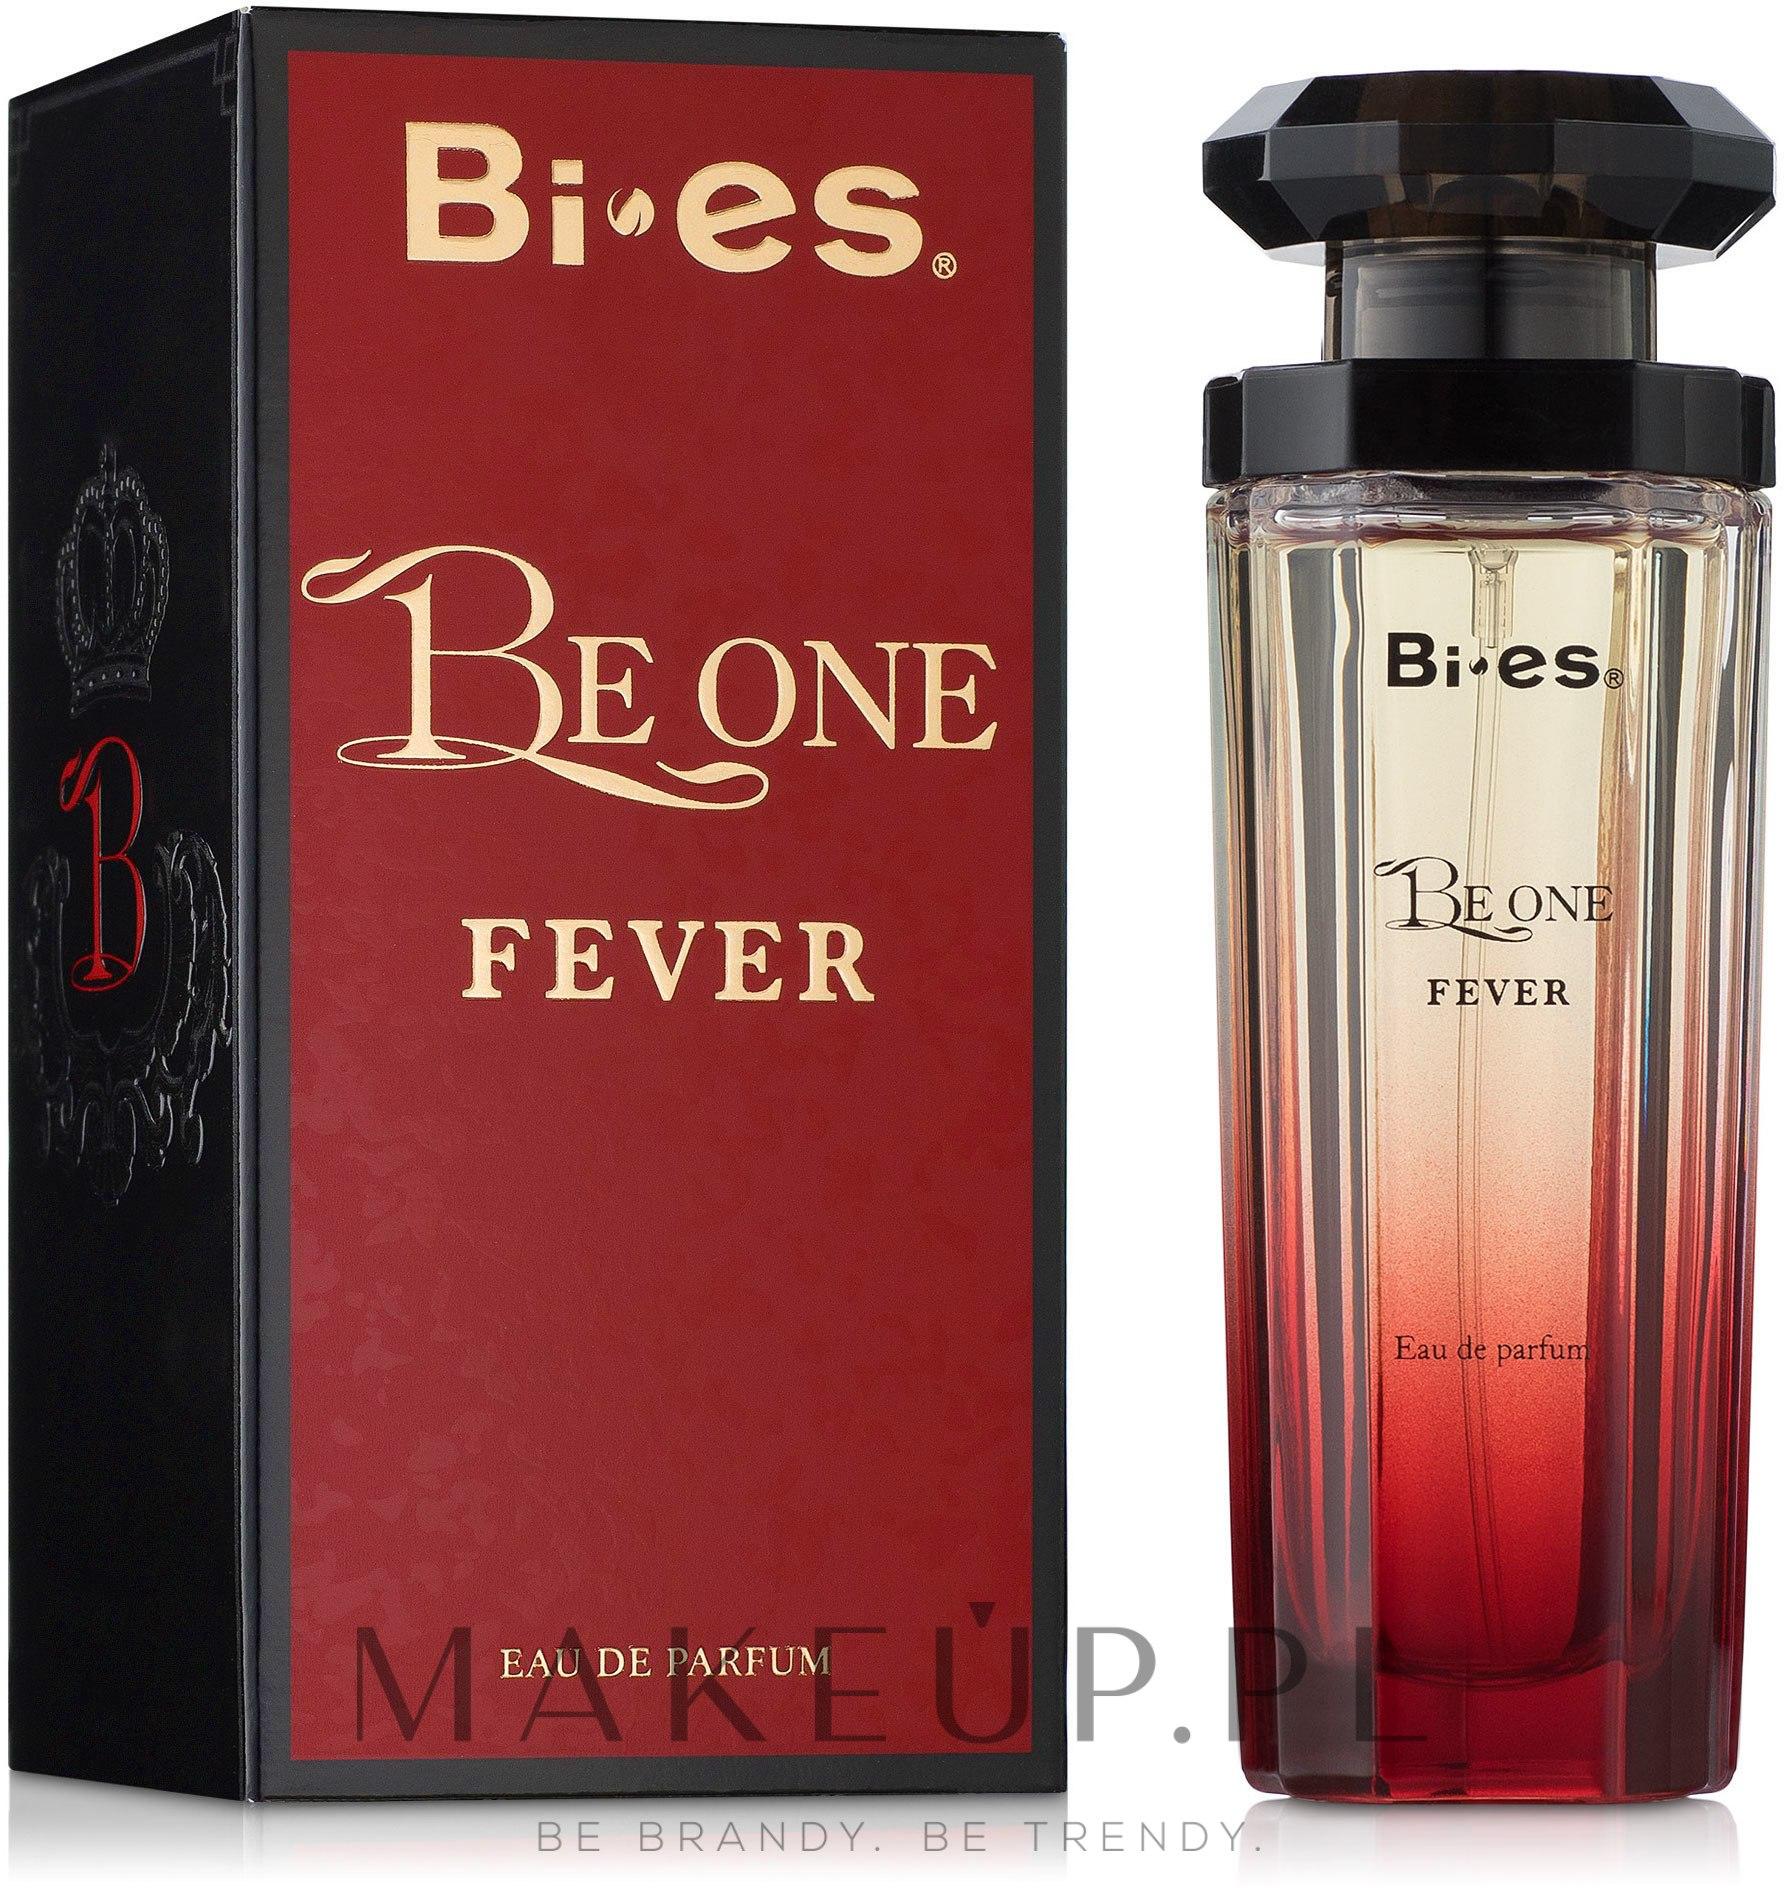 bi-es be one fever